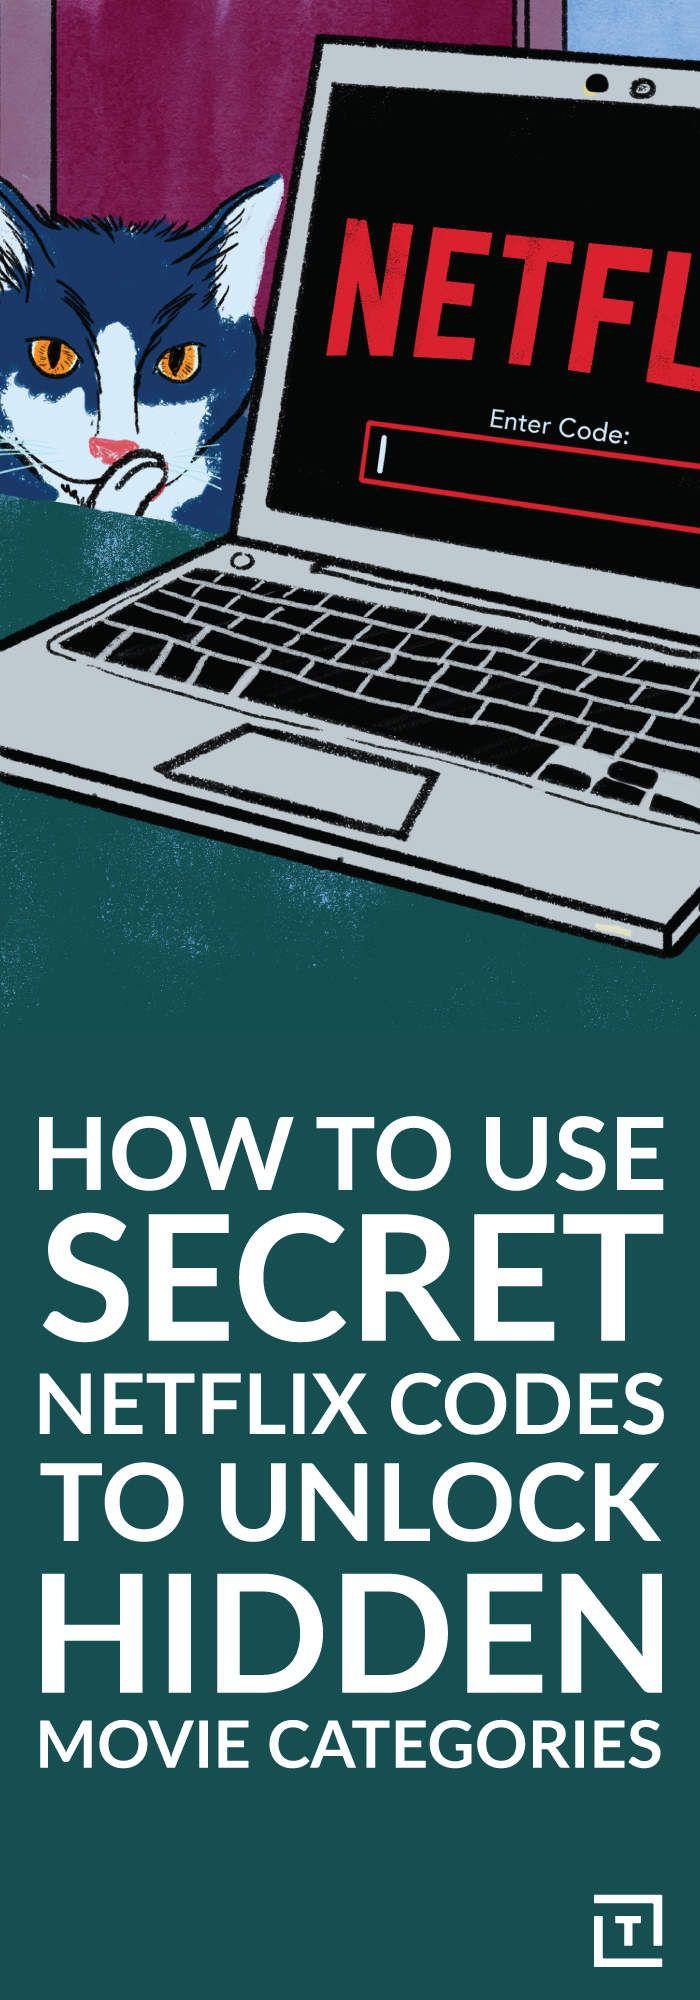 How to use secret Netflix codes to unlock hidden movie categories